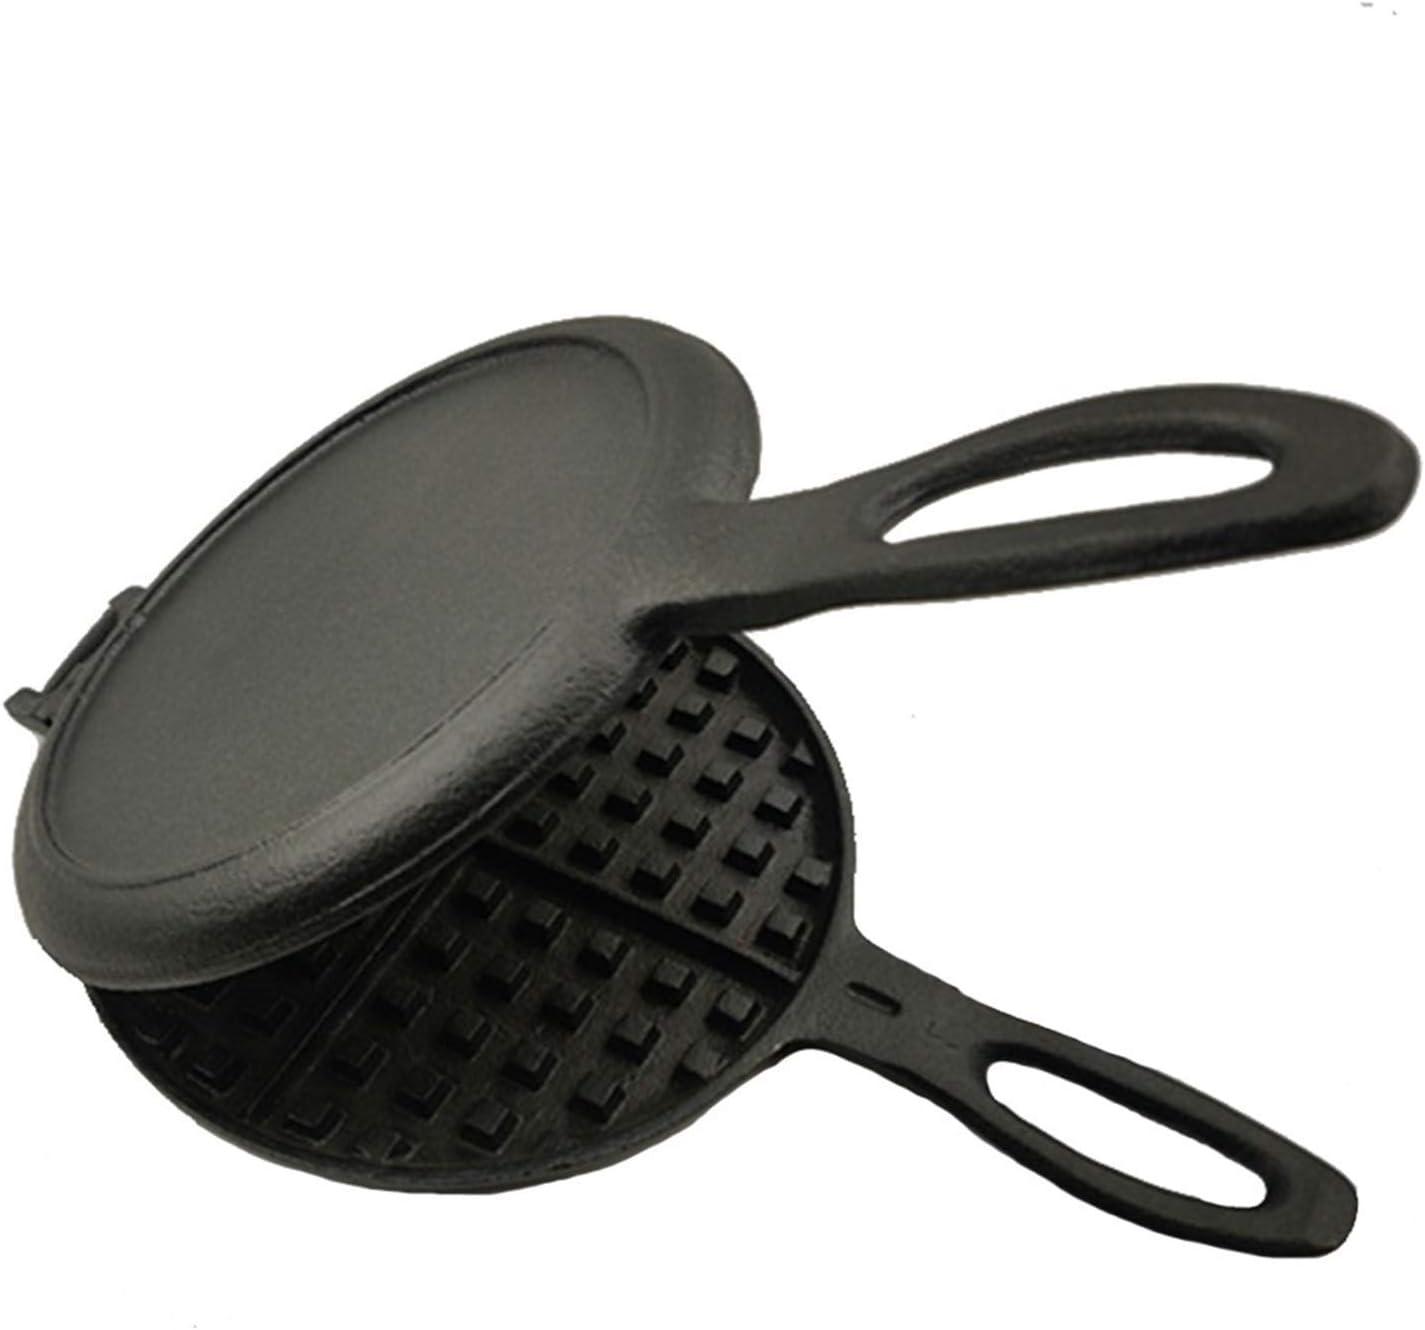 toaster Waffle Maker, Professional Cast Iron Waffle Grill Pan, Sandwich Toaster, Cake Making Toast